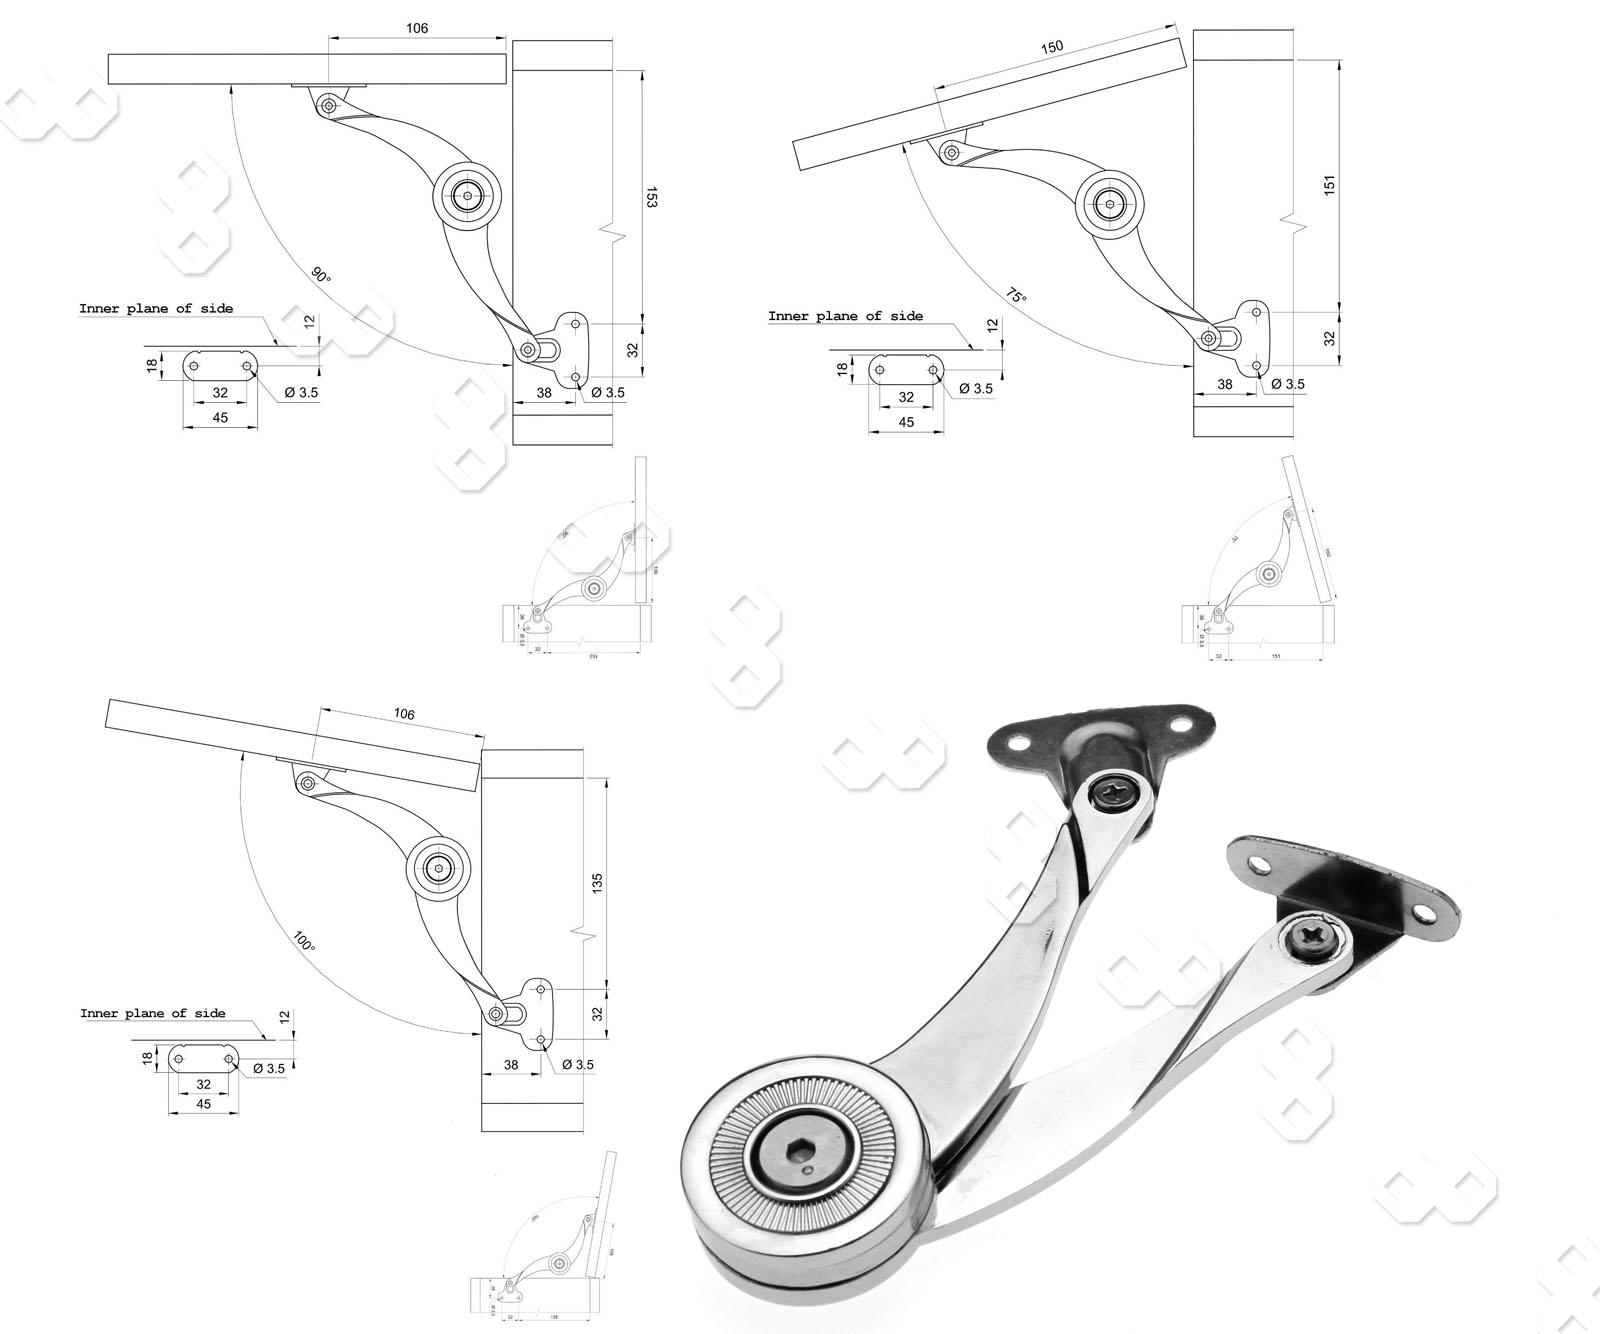 2pcs mechanical friction brake arm lift up lid  door stay